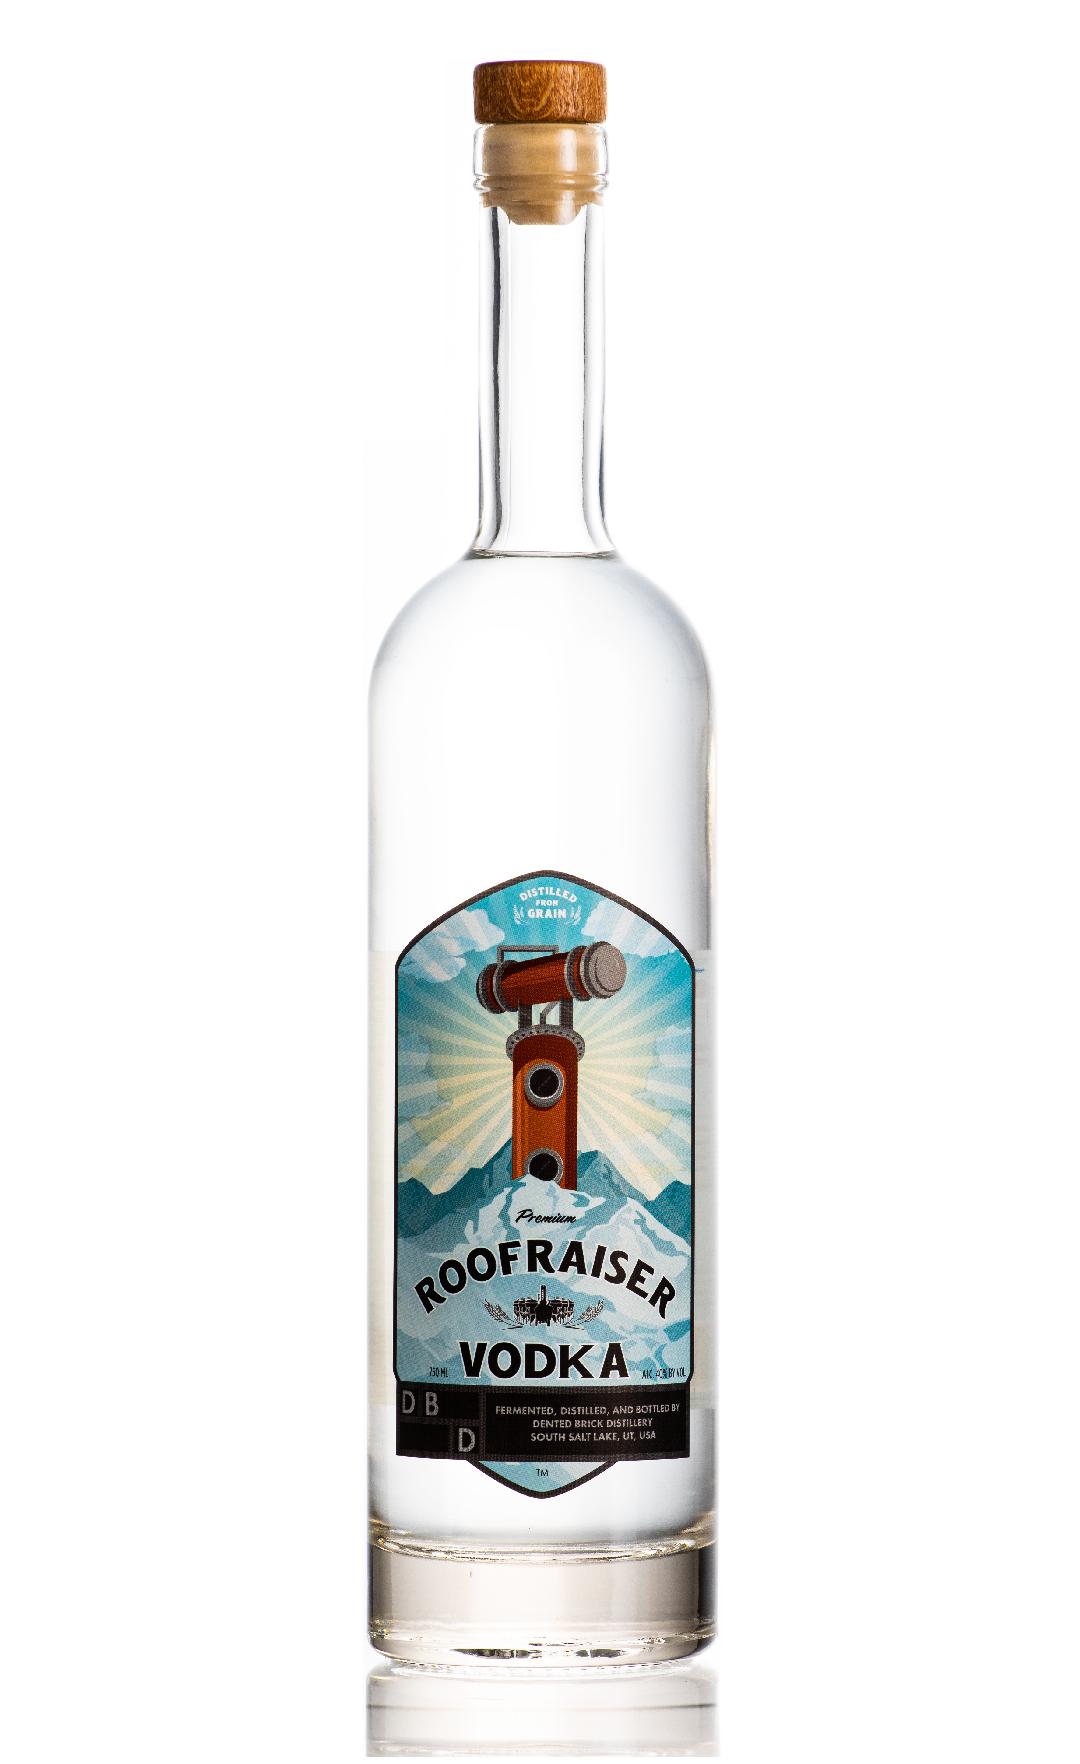 Roof Raiser Vodka by Dented Brick®